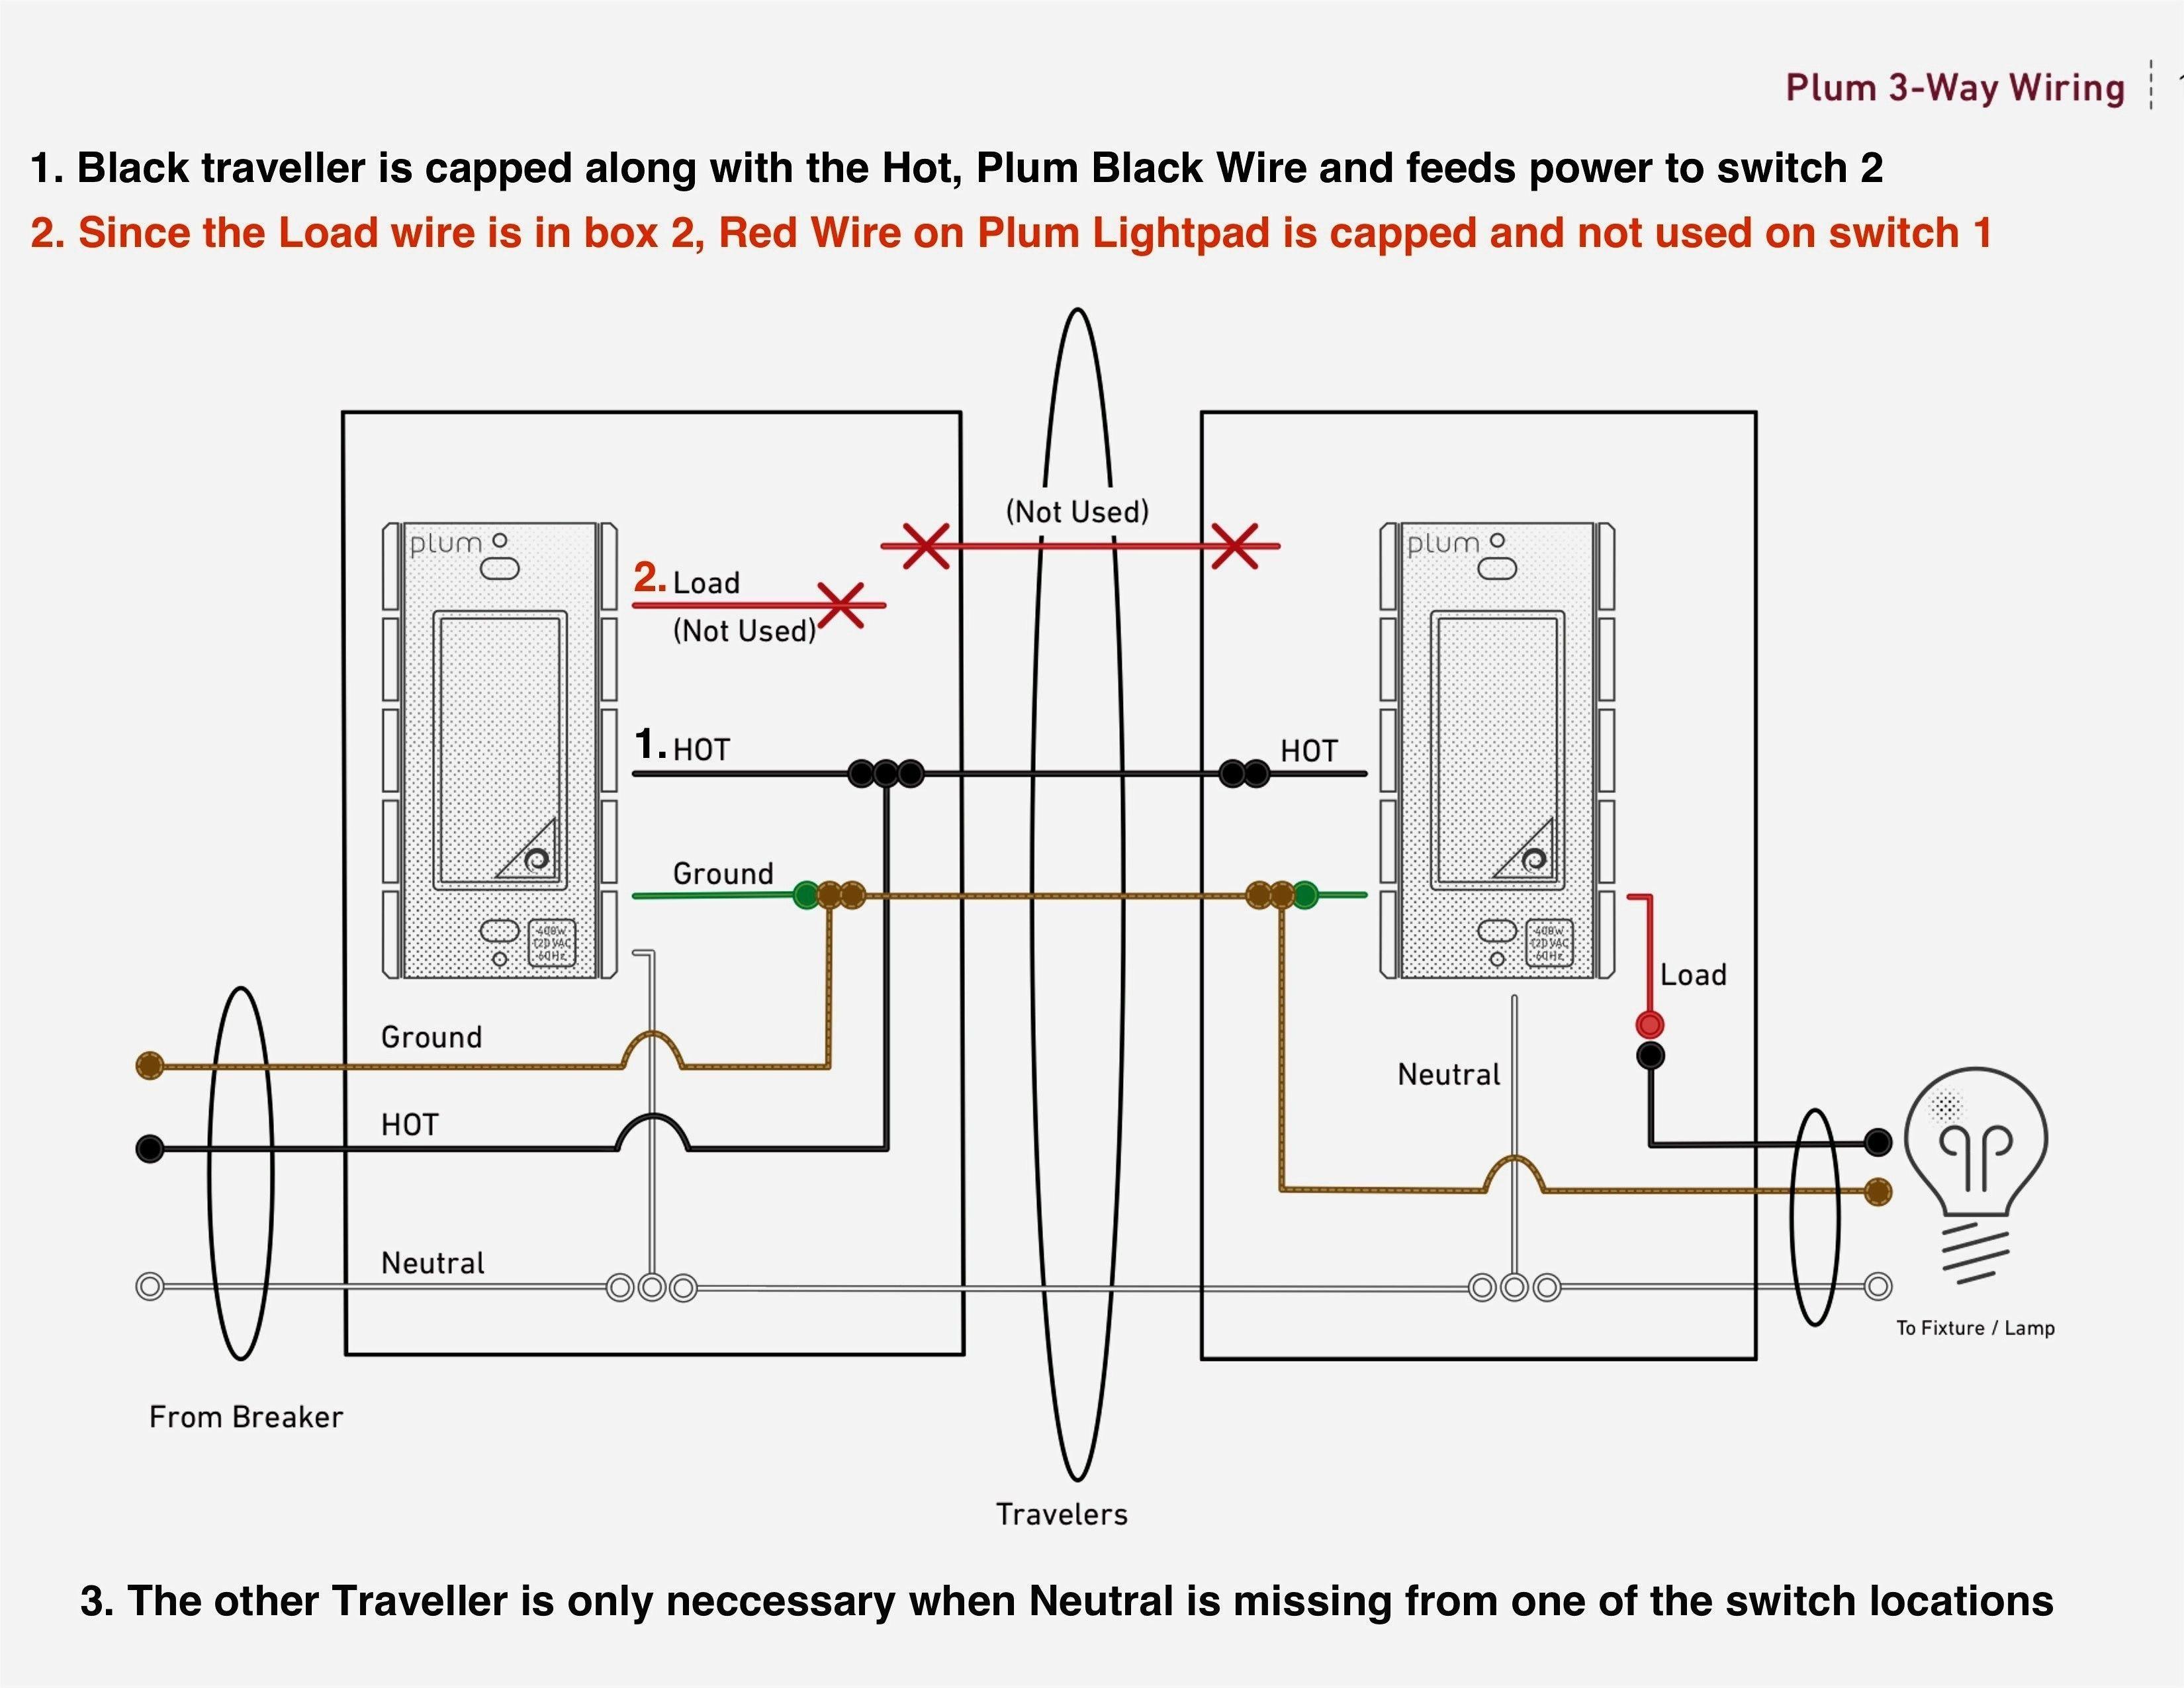 Inspirational Stair Light Switch Wiring Diagram Diagrams Digramssample Diagramimages Wiri Light Switch Wiring 3 Way Switch Wiring Electrical Wiring Diagram